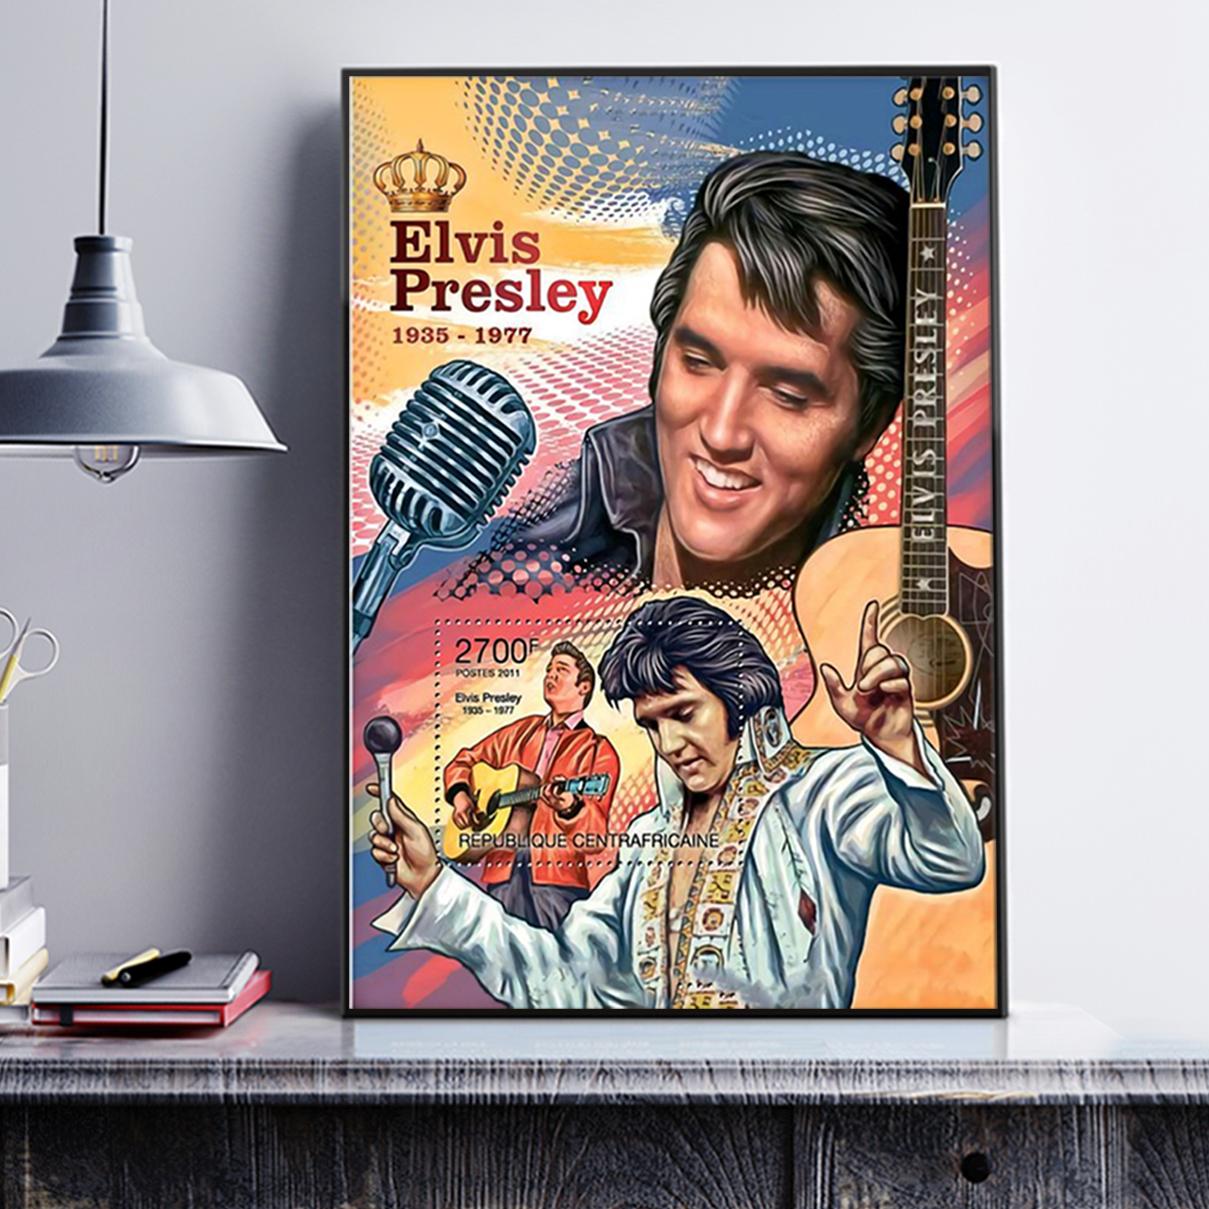 Evis presley king of RnR poster A2